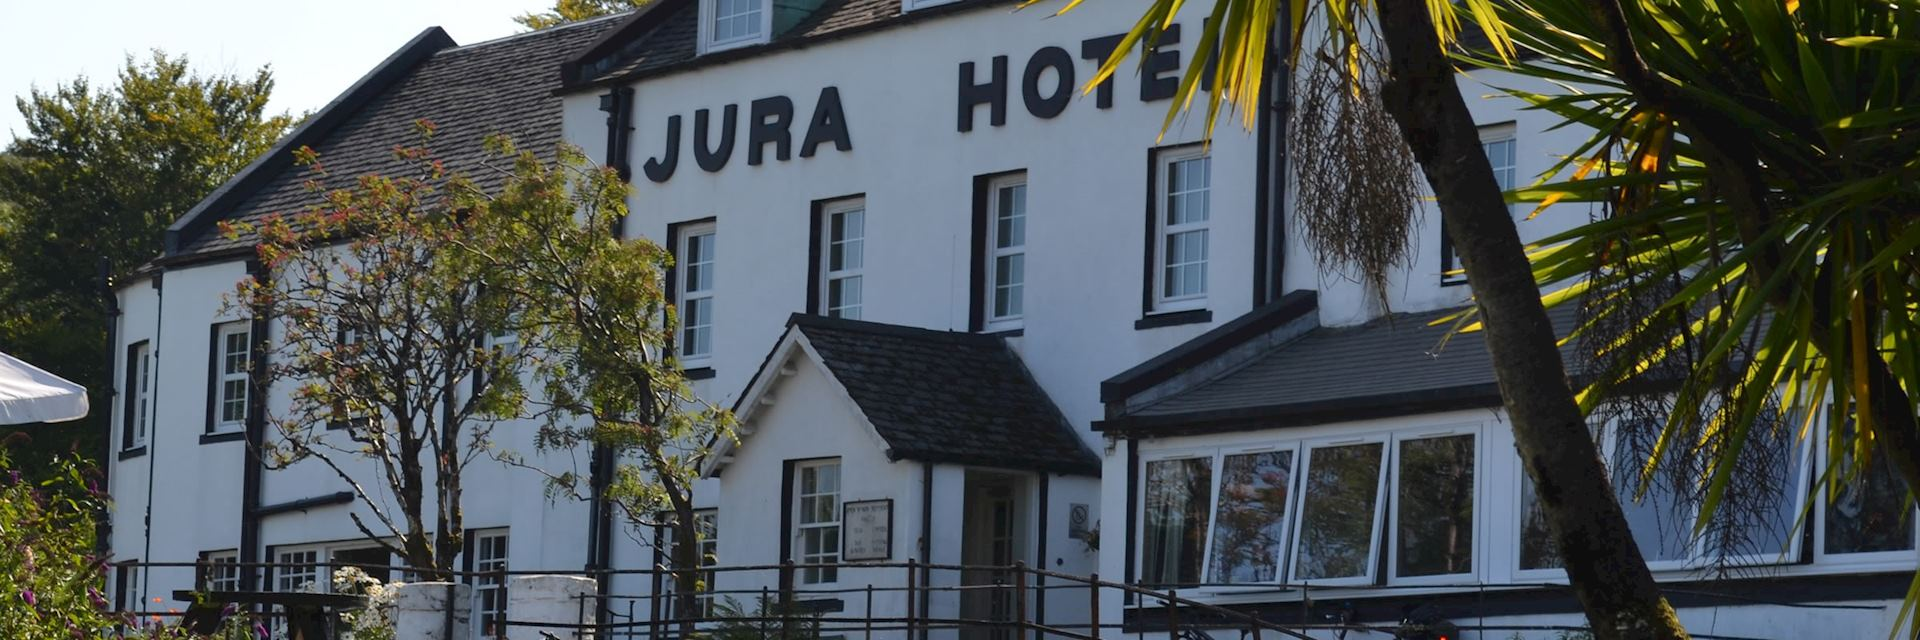 The Jura Hotel